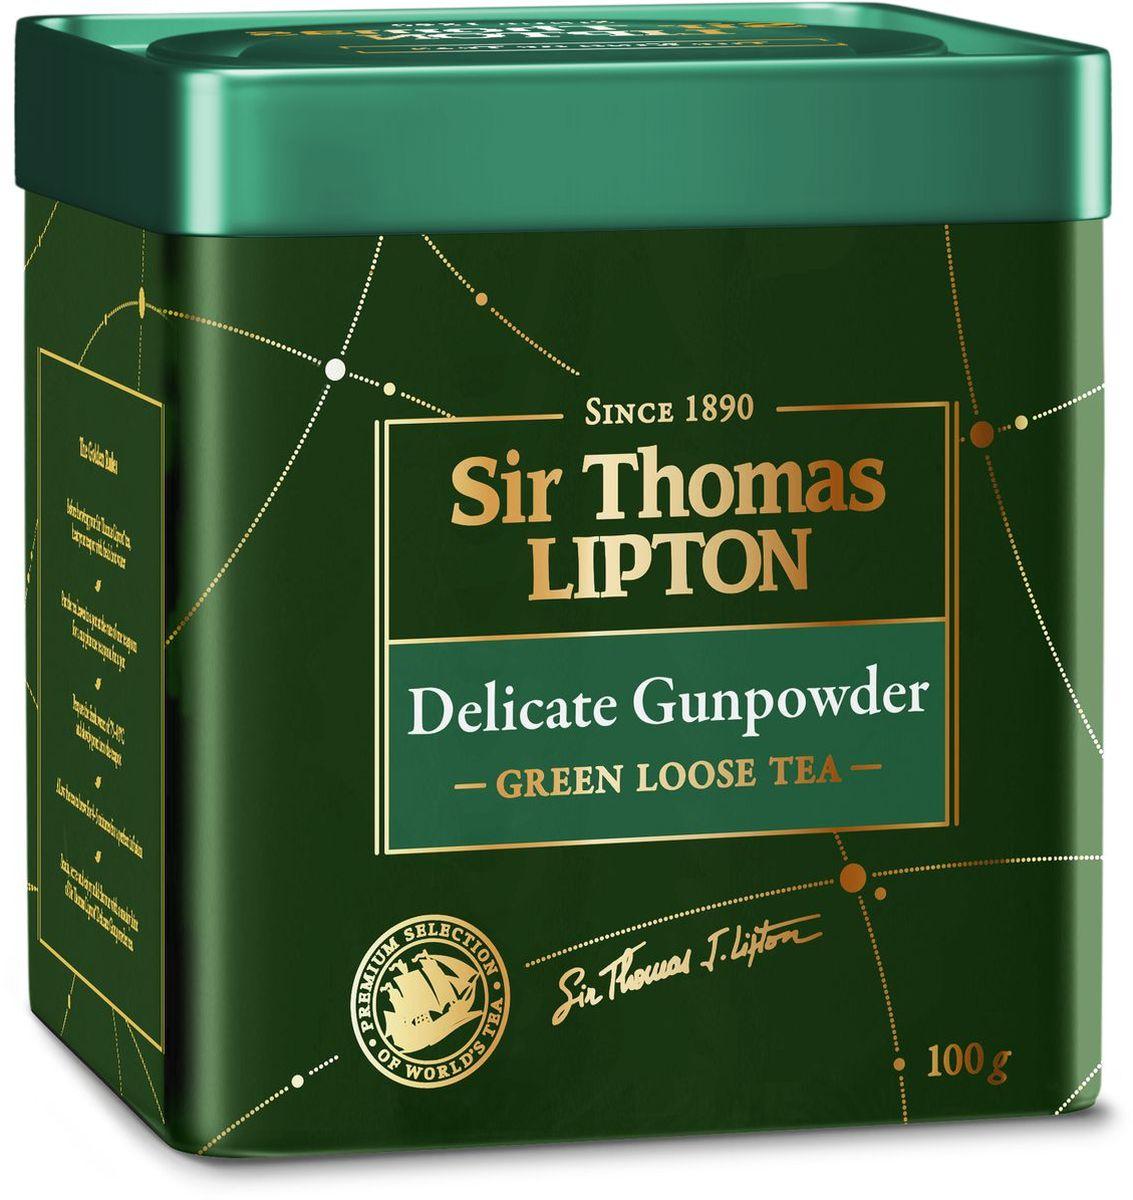 Sir Thomas Lipton Delicate Gunpowder чай зеленый листовой, 100 г delicate love de019ewpcm83 delicate love